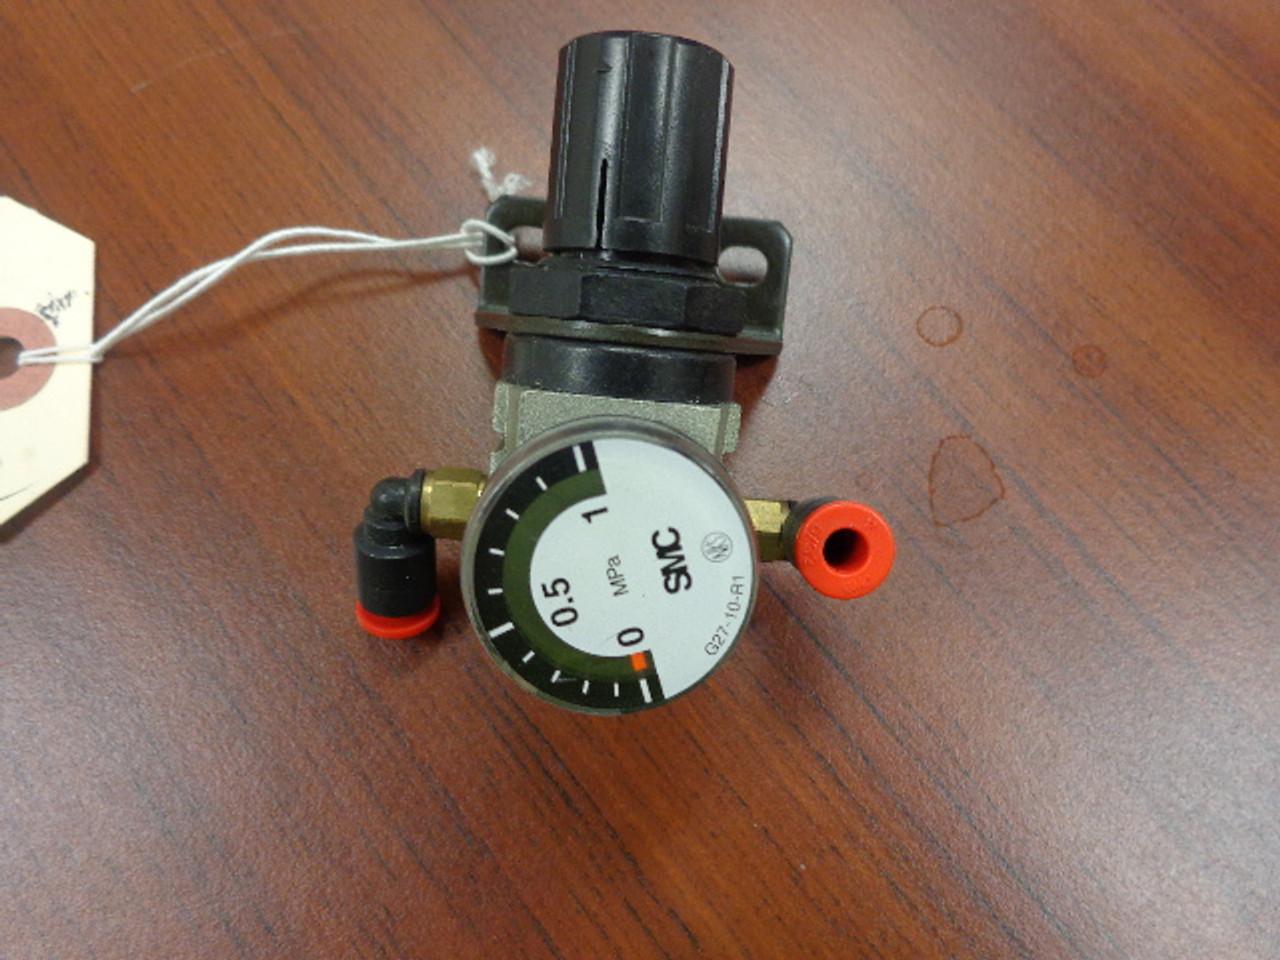 SMC AR1000-M5-1 Air Regulator w/Guage 0-1 Mpa